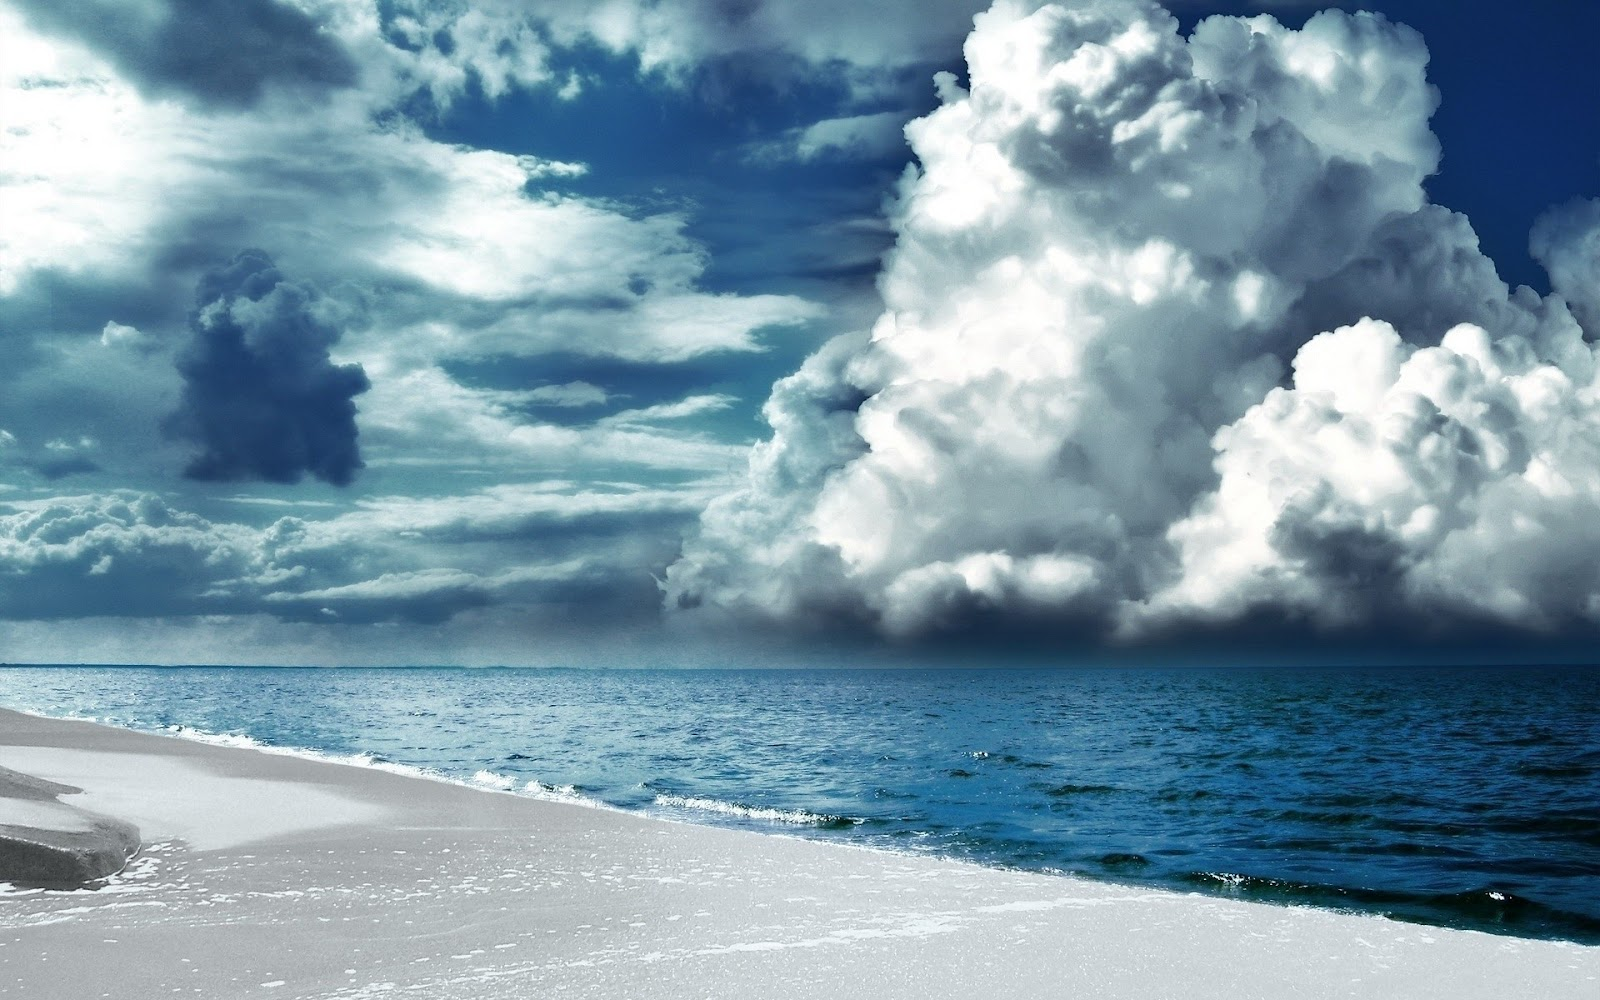 http://4.bp.blogspot.com/-8YSAJTLkg44/UEAvas9Xy4I/AAAAAAAADEA/FV_hnbEVZc4/s1600/cool_beach_scape-1920x1200.jpg%2520